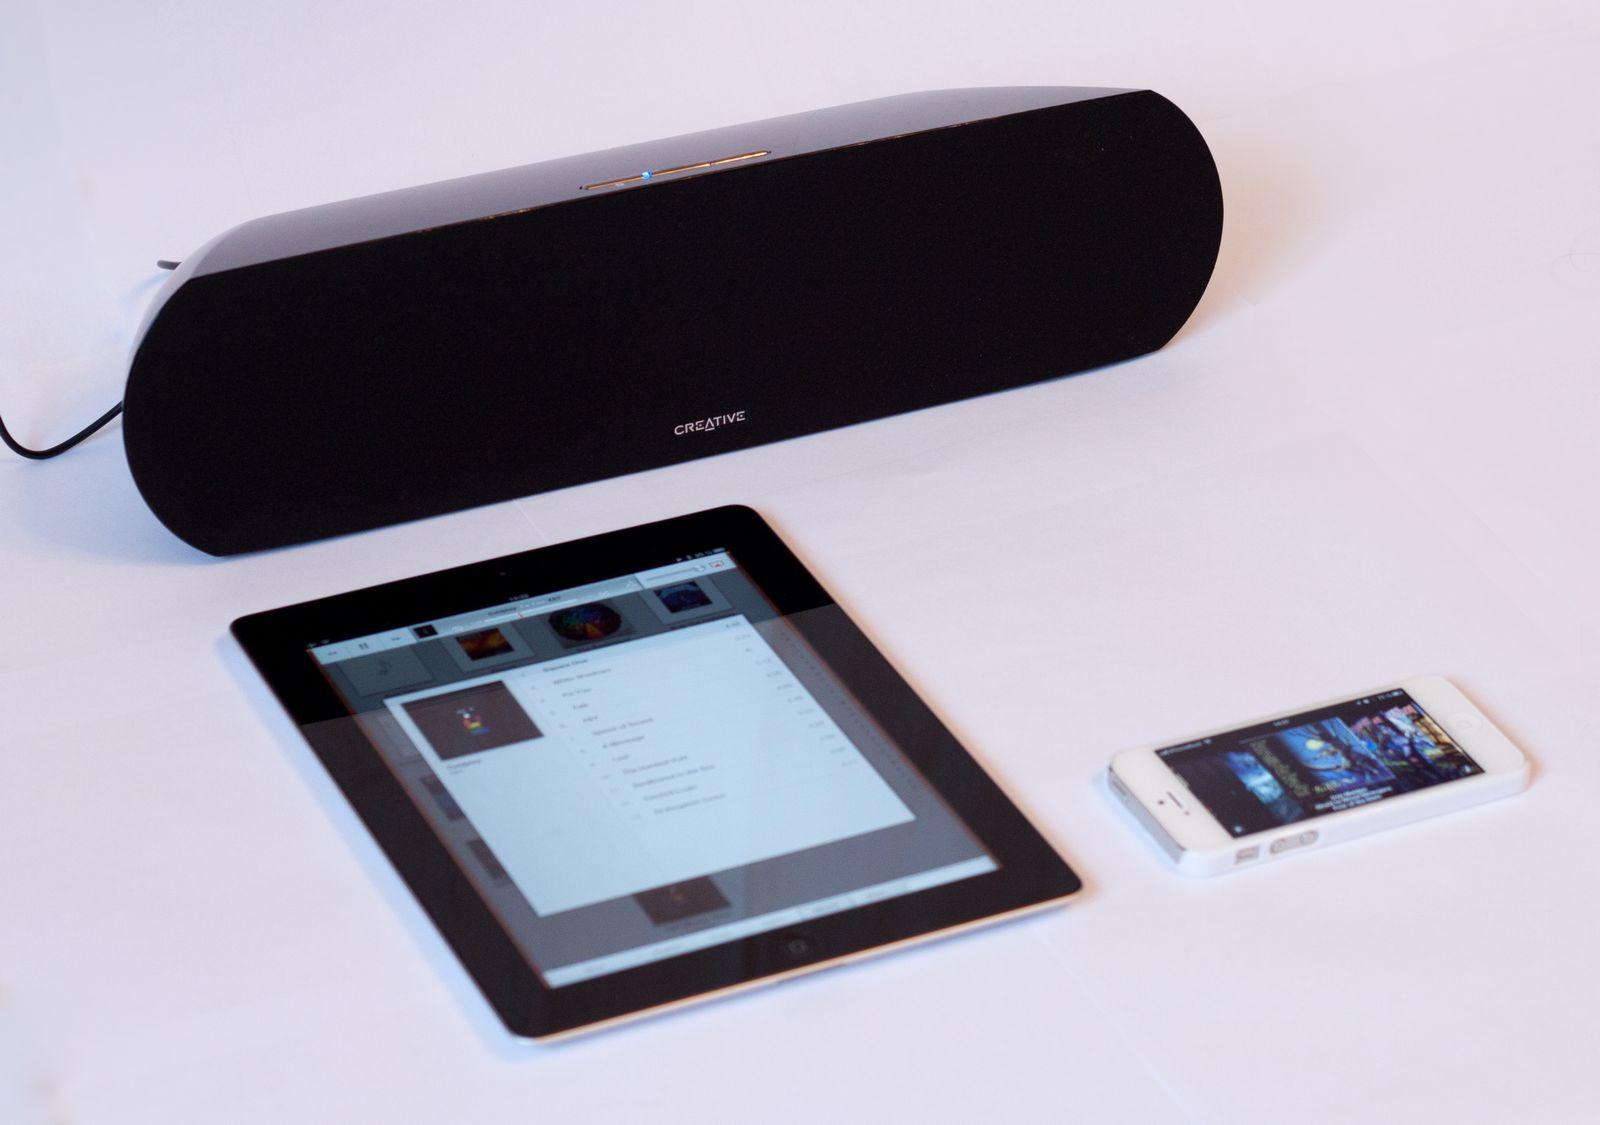 bluetooth wireless audio creative d200 iphoneroot com rh iphoneroot com D200 Review D200 W204